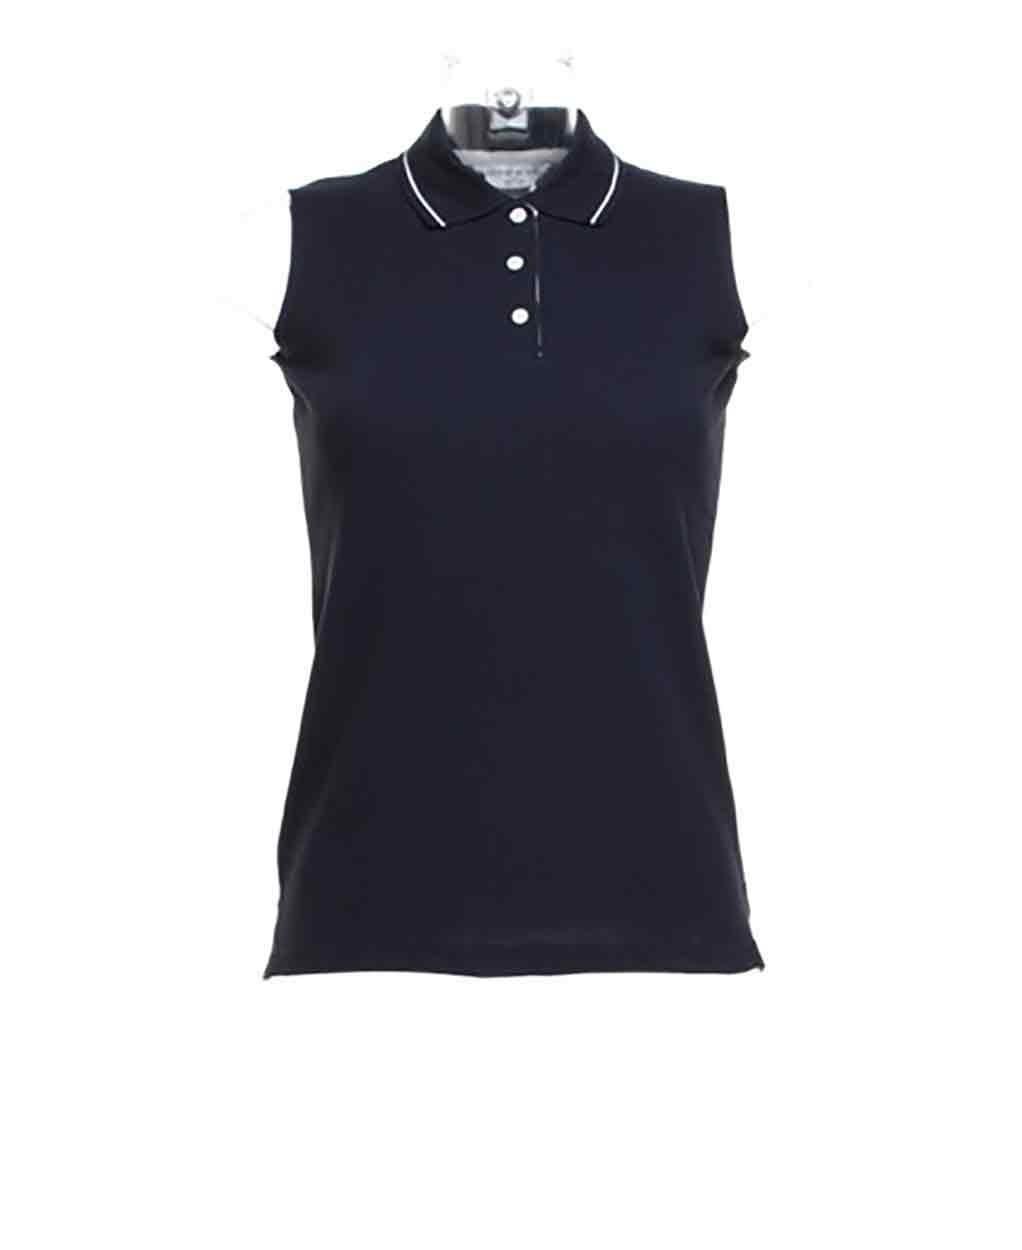 71b3a8702c0a6 Gamegear Ladies Proactive Sleeveless Pique Polo Shirt. Zoom · Women s  Gamegear Proactive Polo Navy White ...